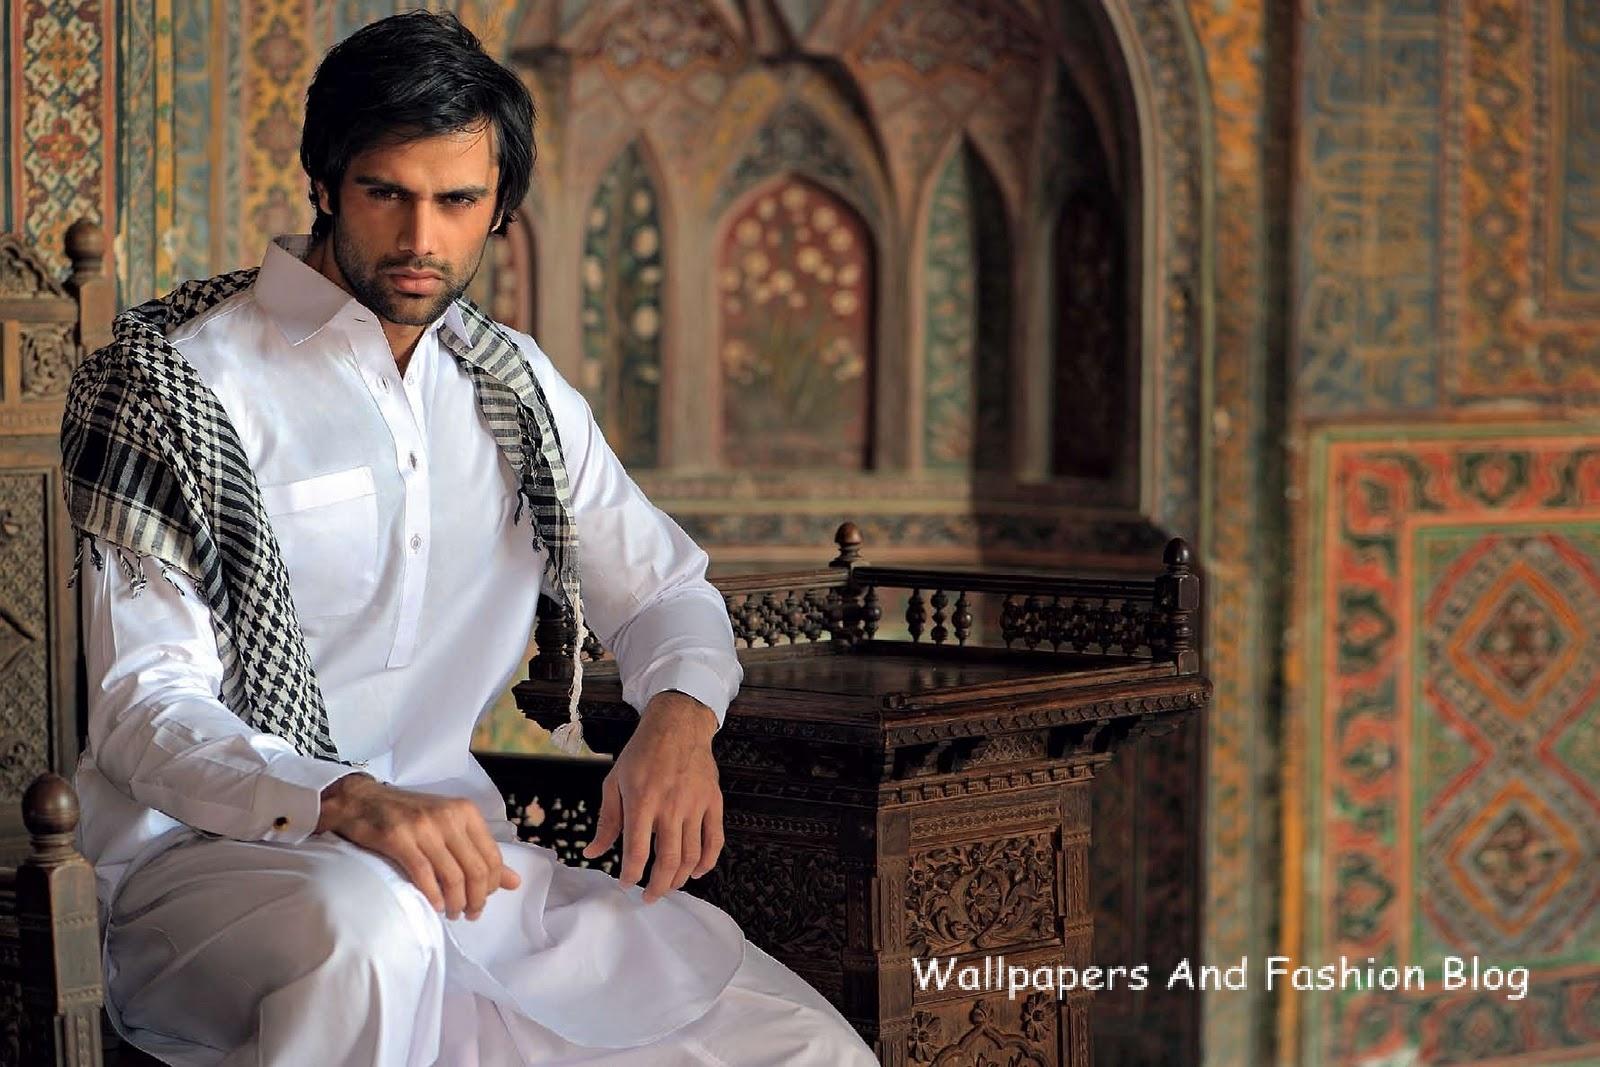 http://2.bp.blogspot.com/-VbS3zlZc79A/TpcH_7wHzOI/AAAAAAAACOA/iH0r1eX3FHI/s1600/Gull_Ahmad_latest_men_kurta_designs_summer_collection_casual_wearing+%25286%2529.jpg